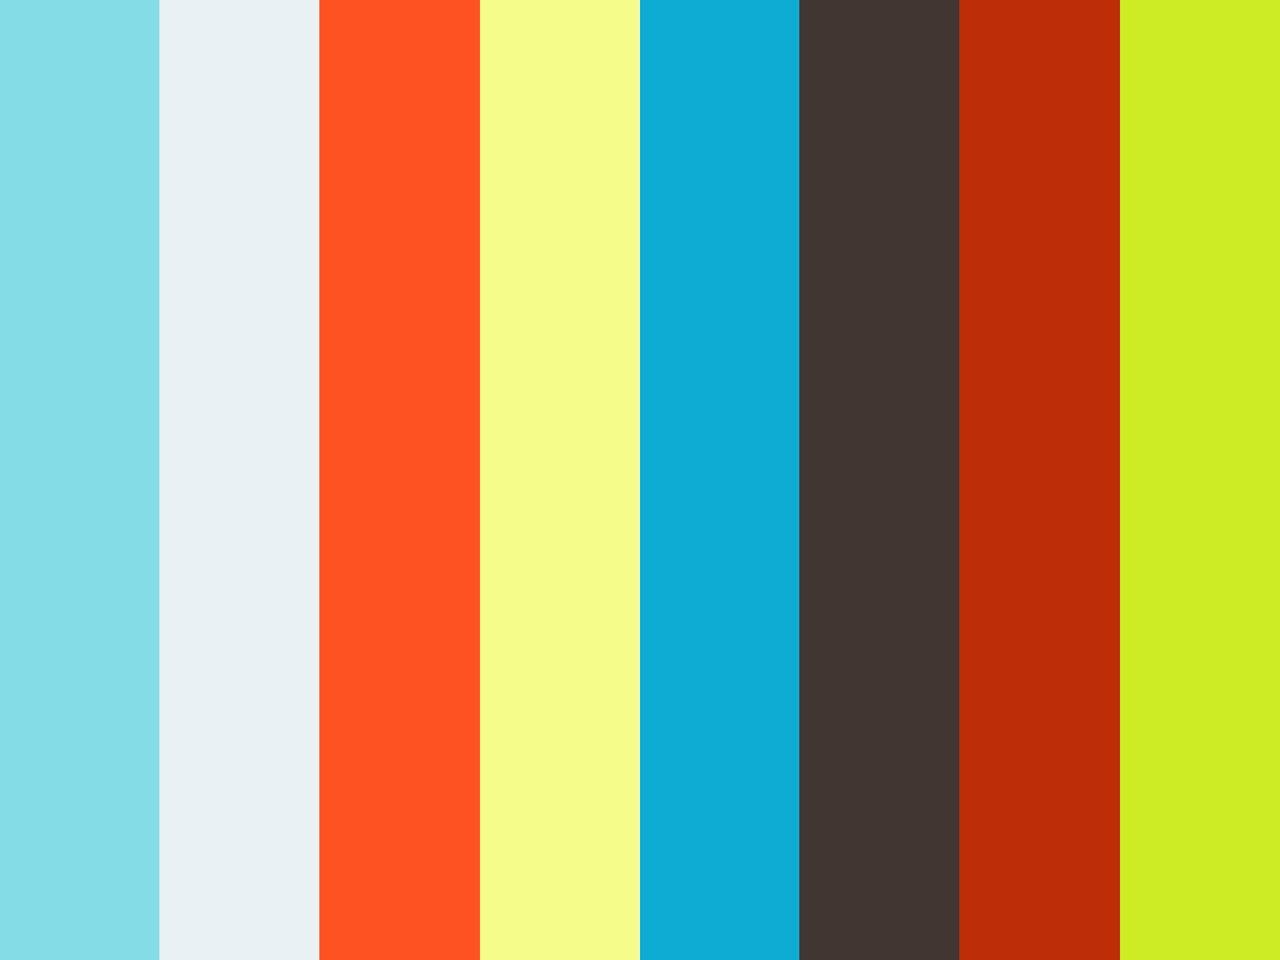 Molokai Covid19 Update - Tuesday, April 28, 2020